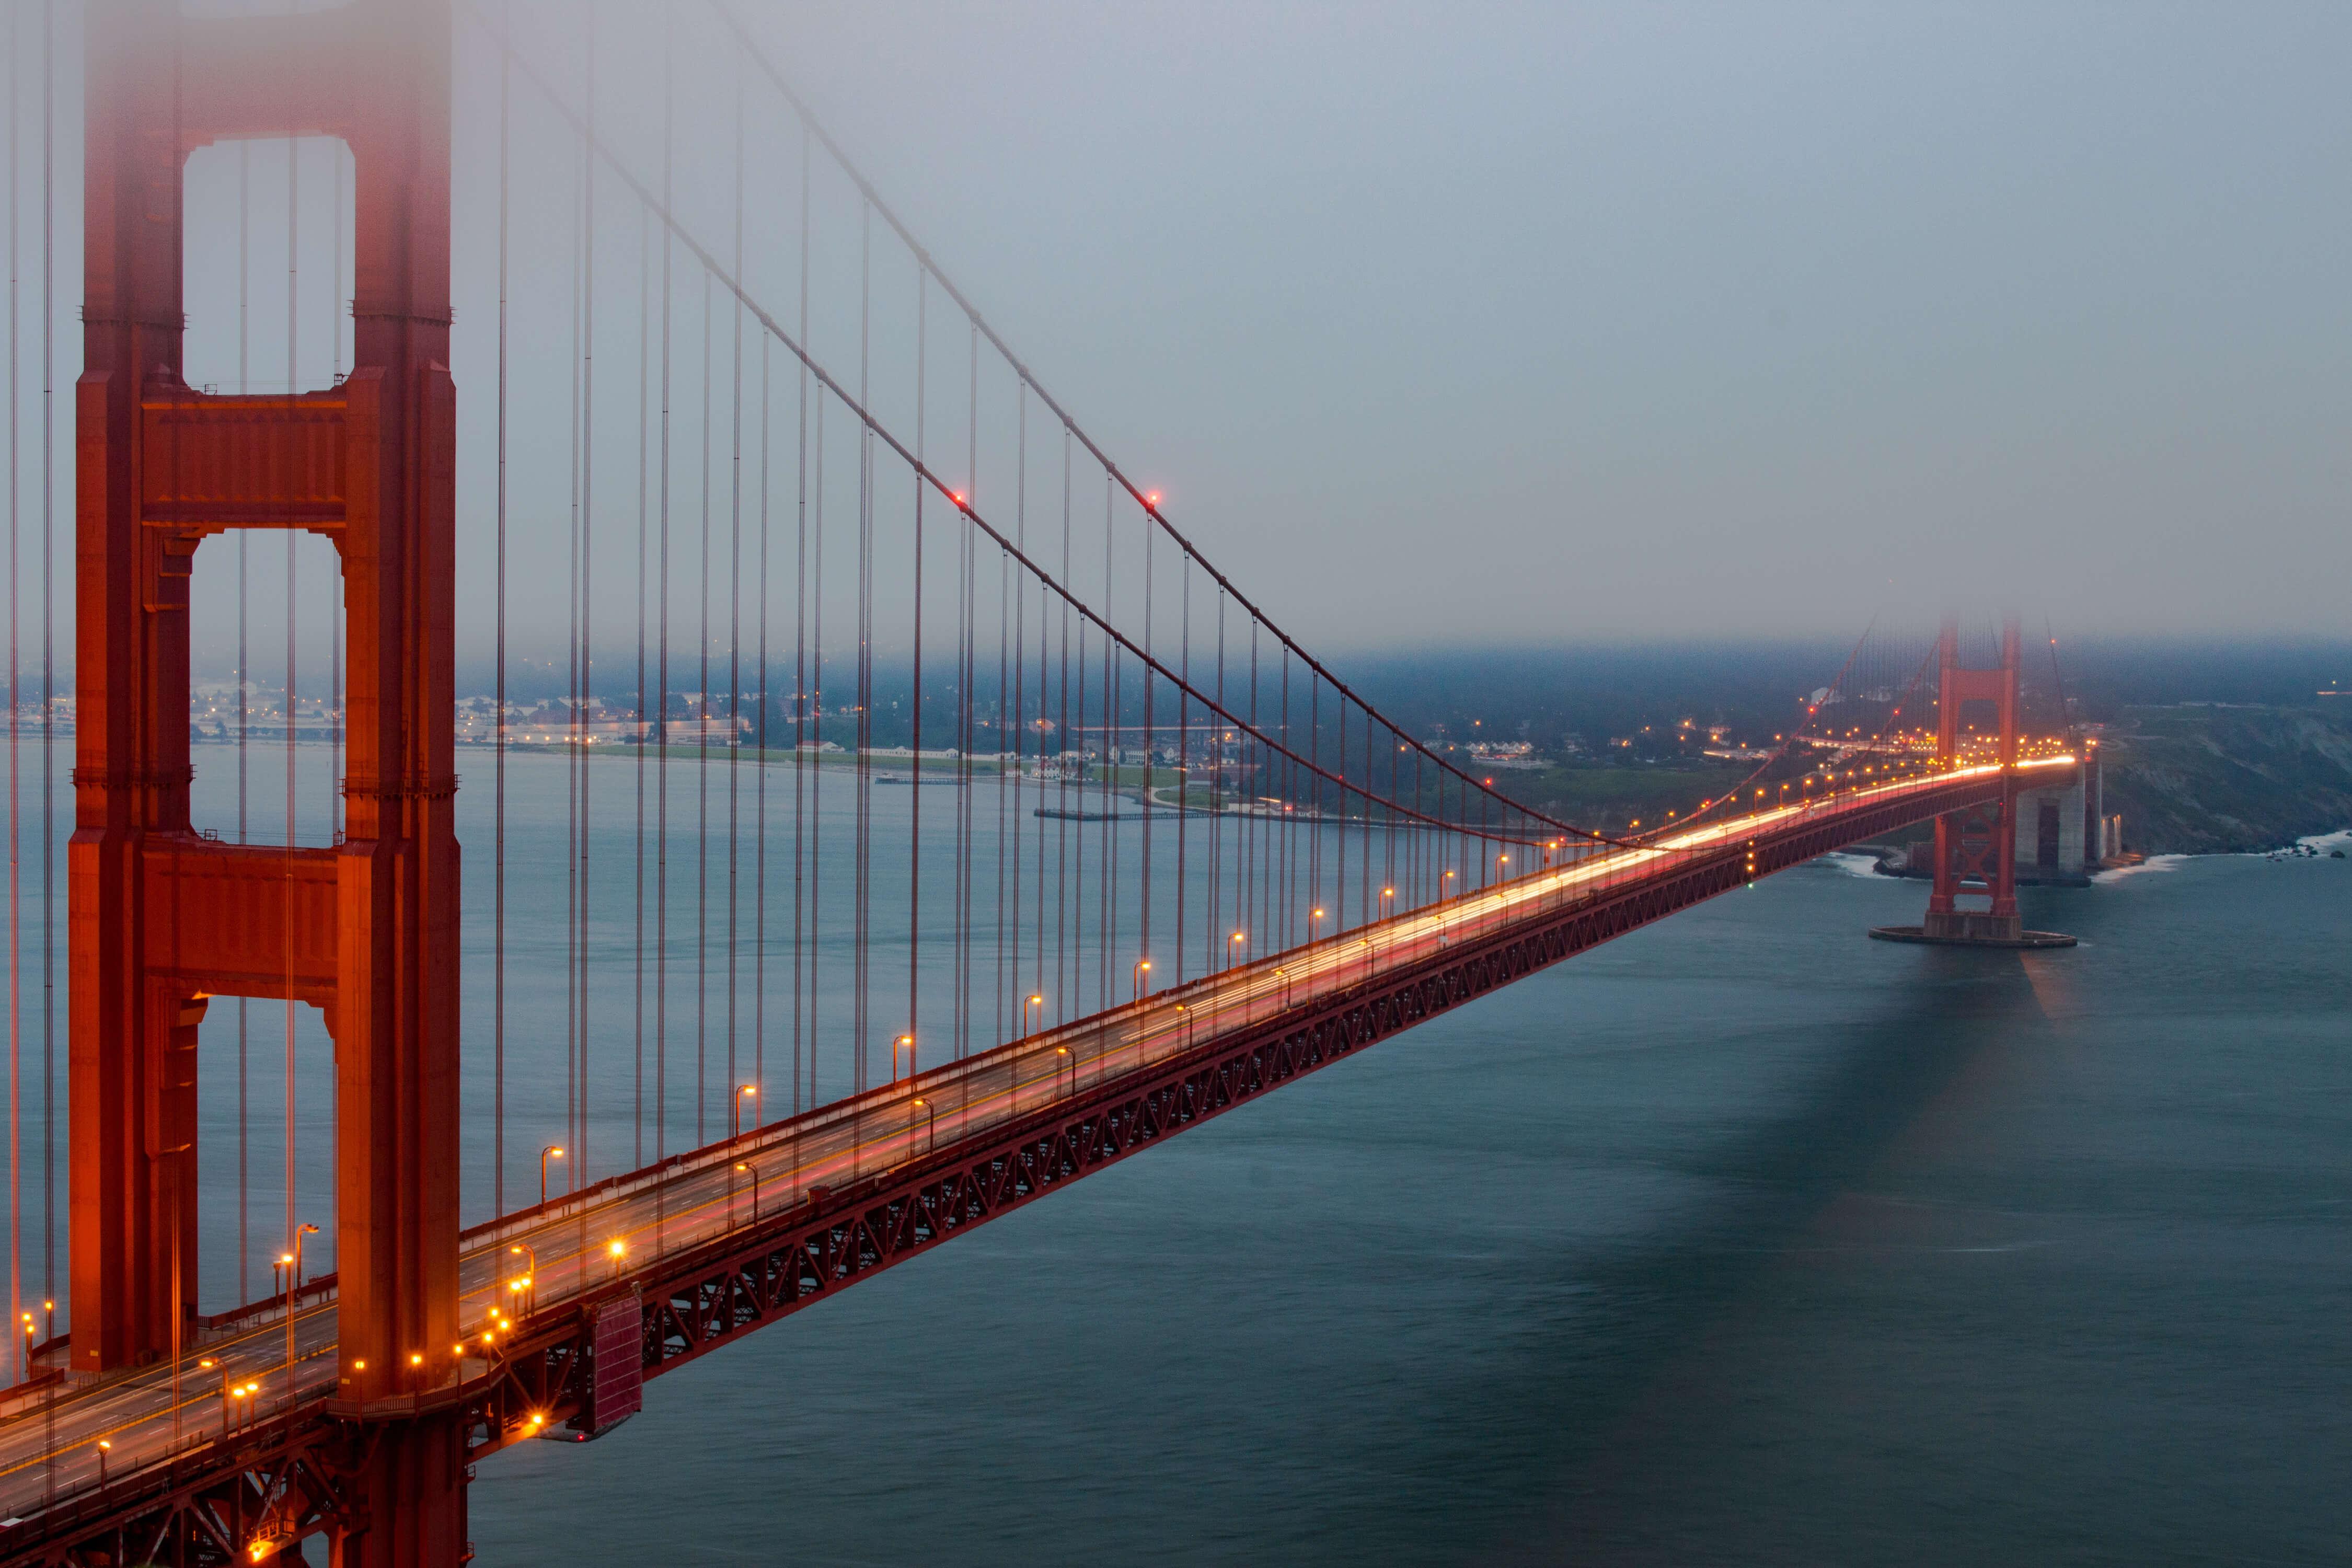 Golden Gate Bridge in the fog by Scott